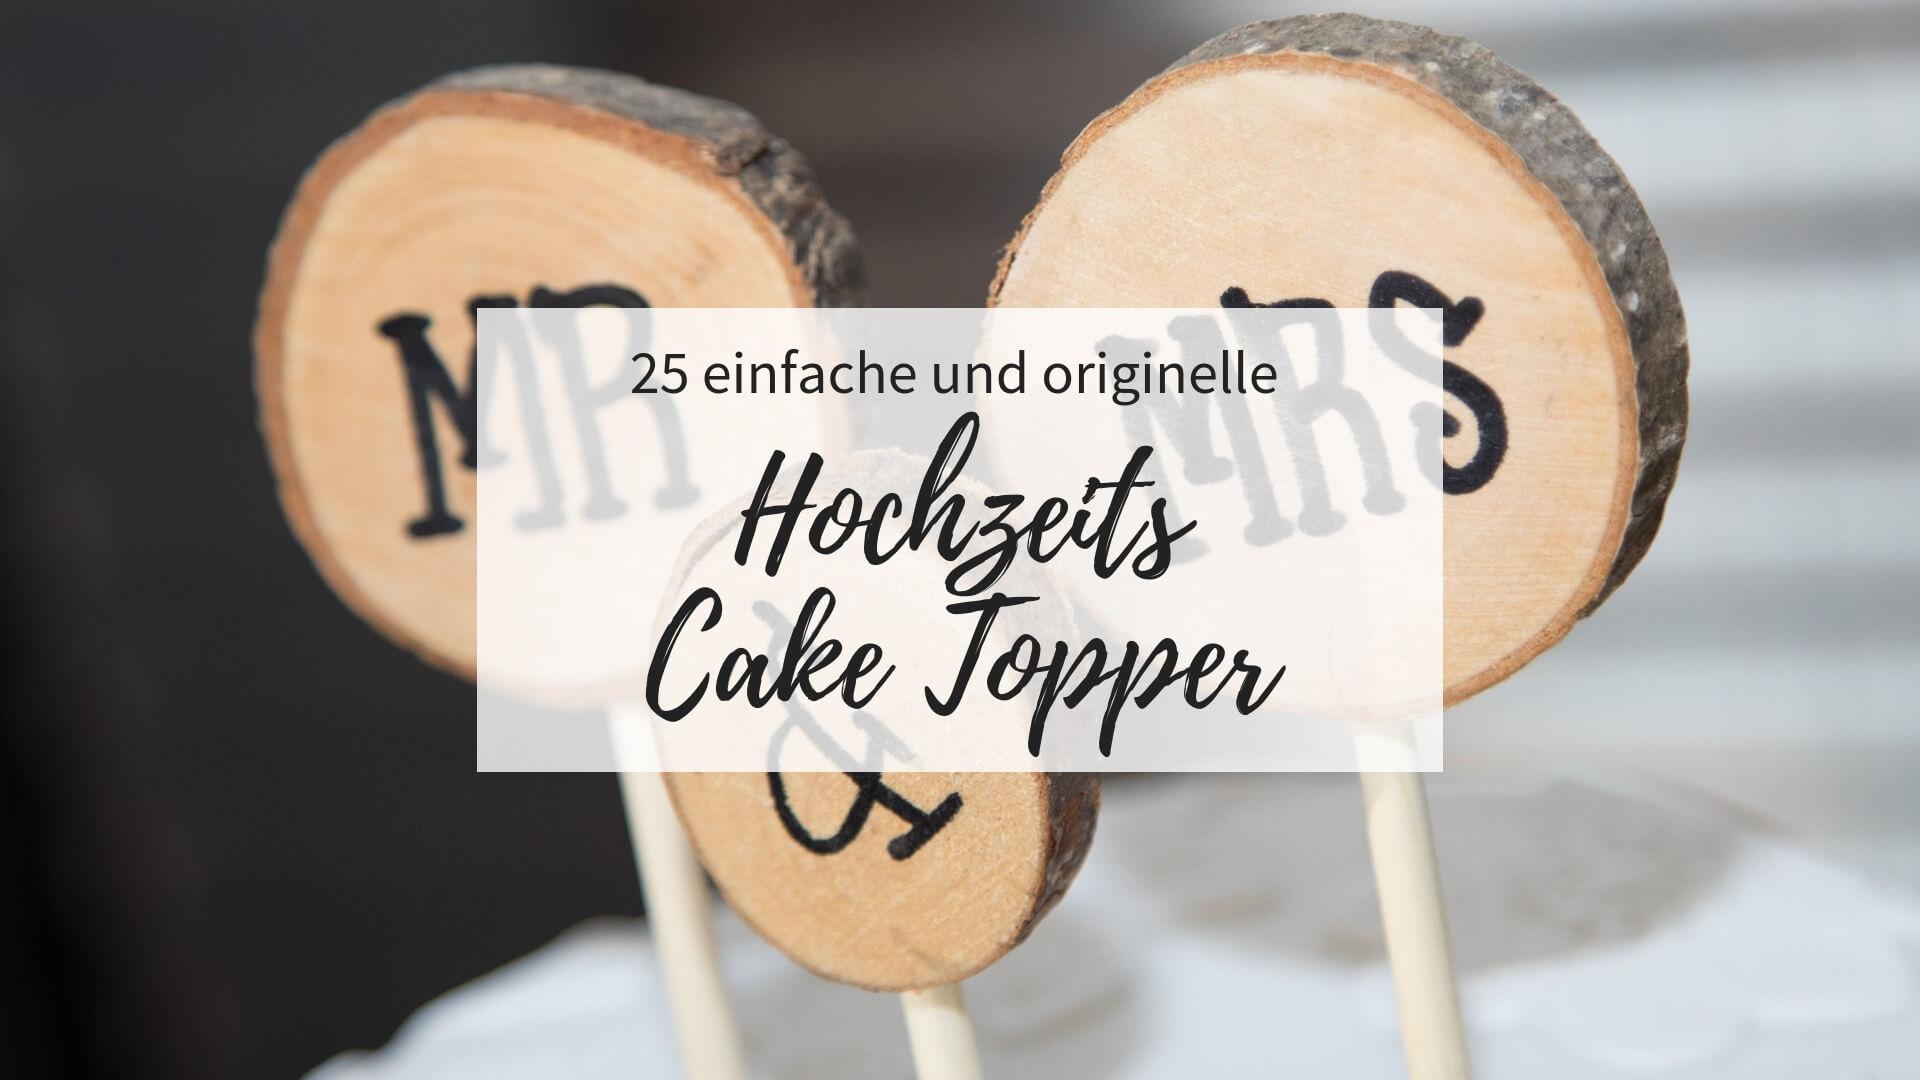 Cake Topper Hochzeit, Cake Topper lustig, Hochzeitstorte Cake Topper, DIY Cake Topper